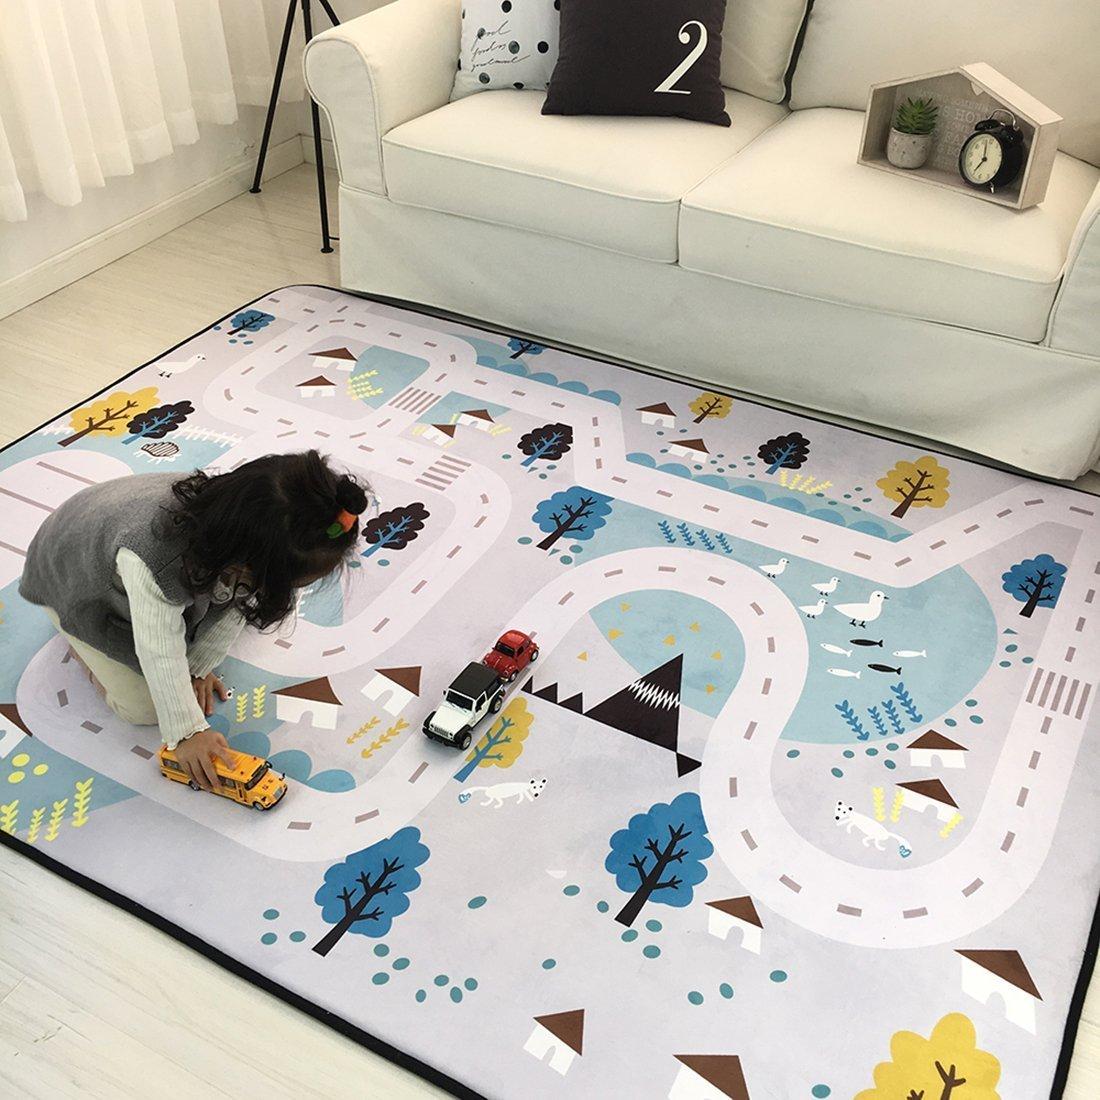 Amazon.com: Cusphorn Kids Carpet Playmat Rug Village Life Great For ...